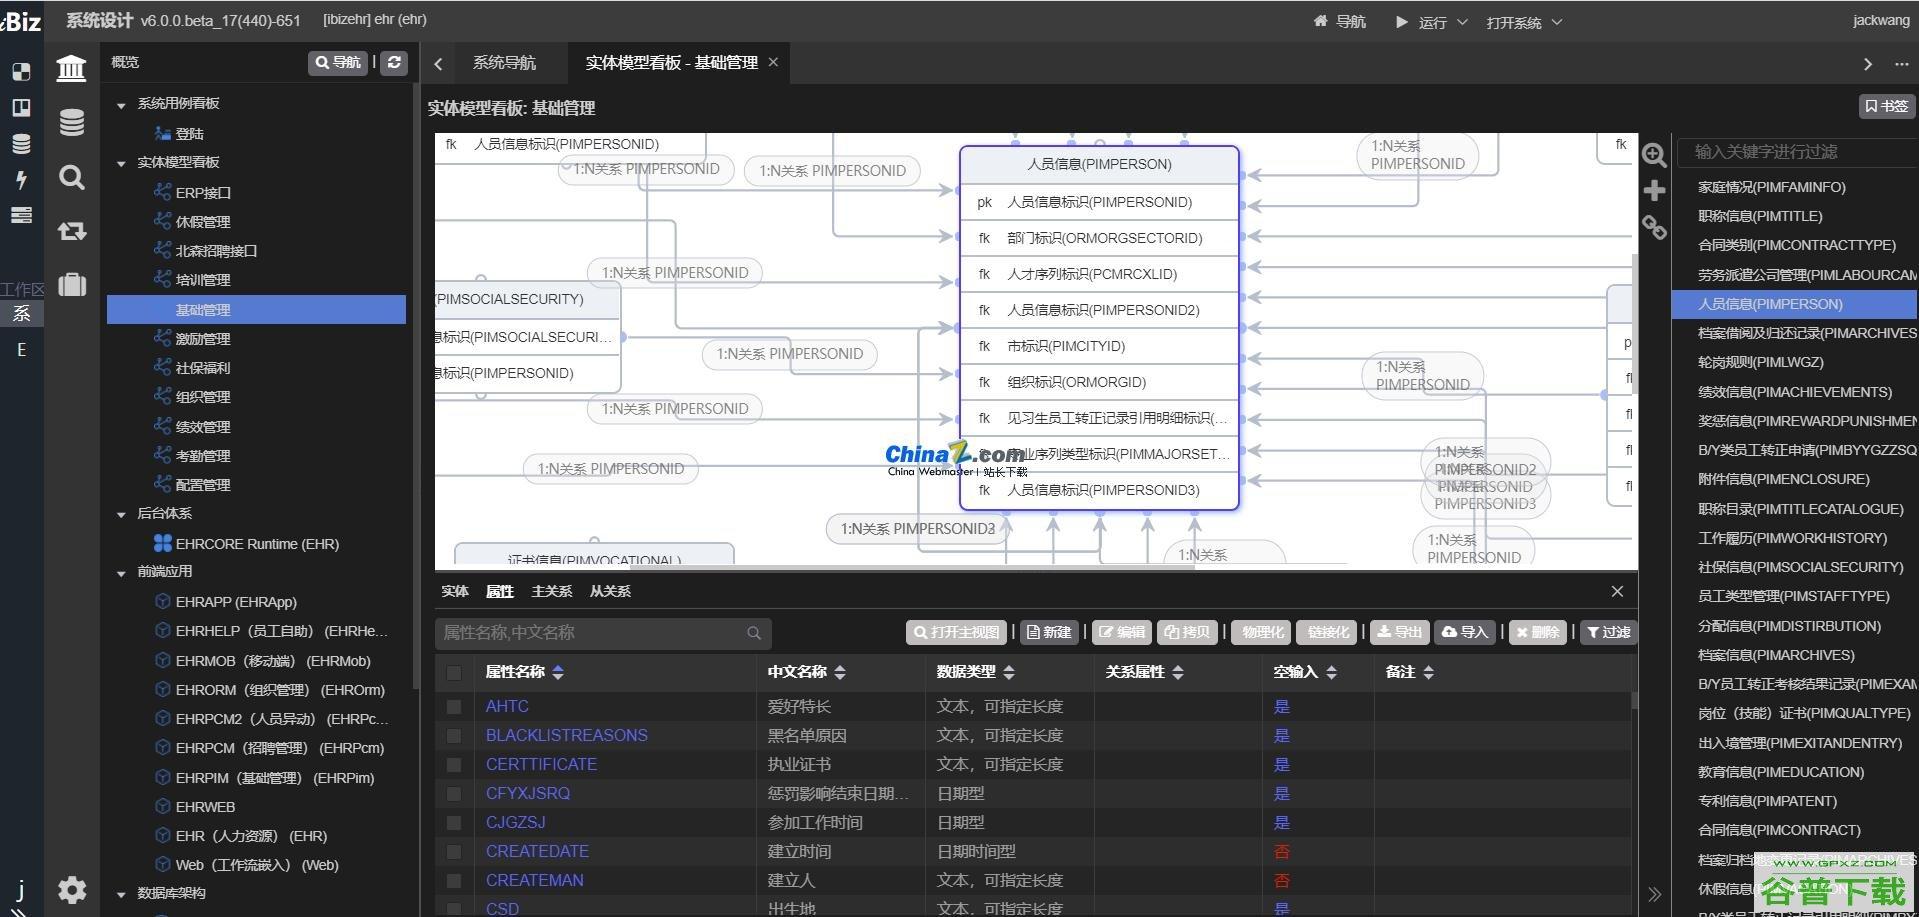 iBizEHR高性能人力资源管理软件源代码免费下载